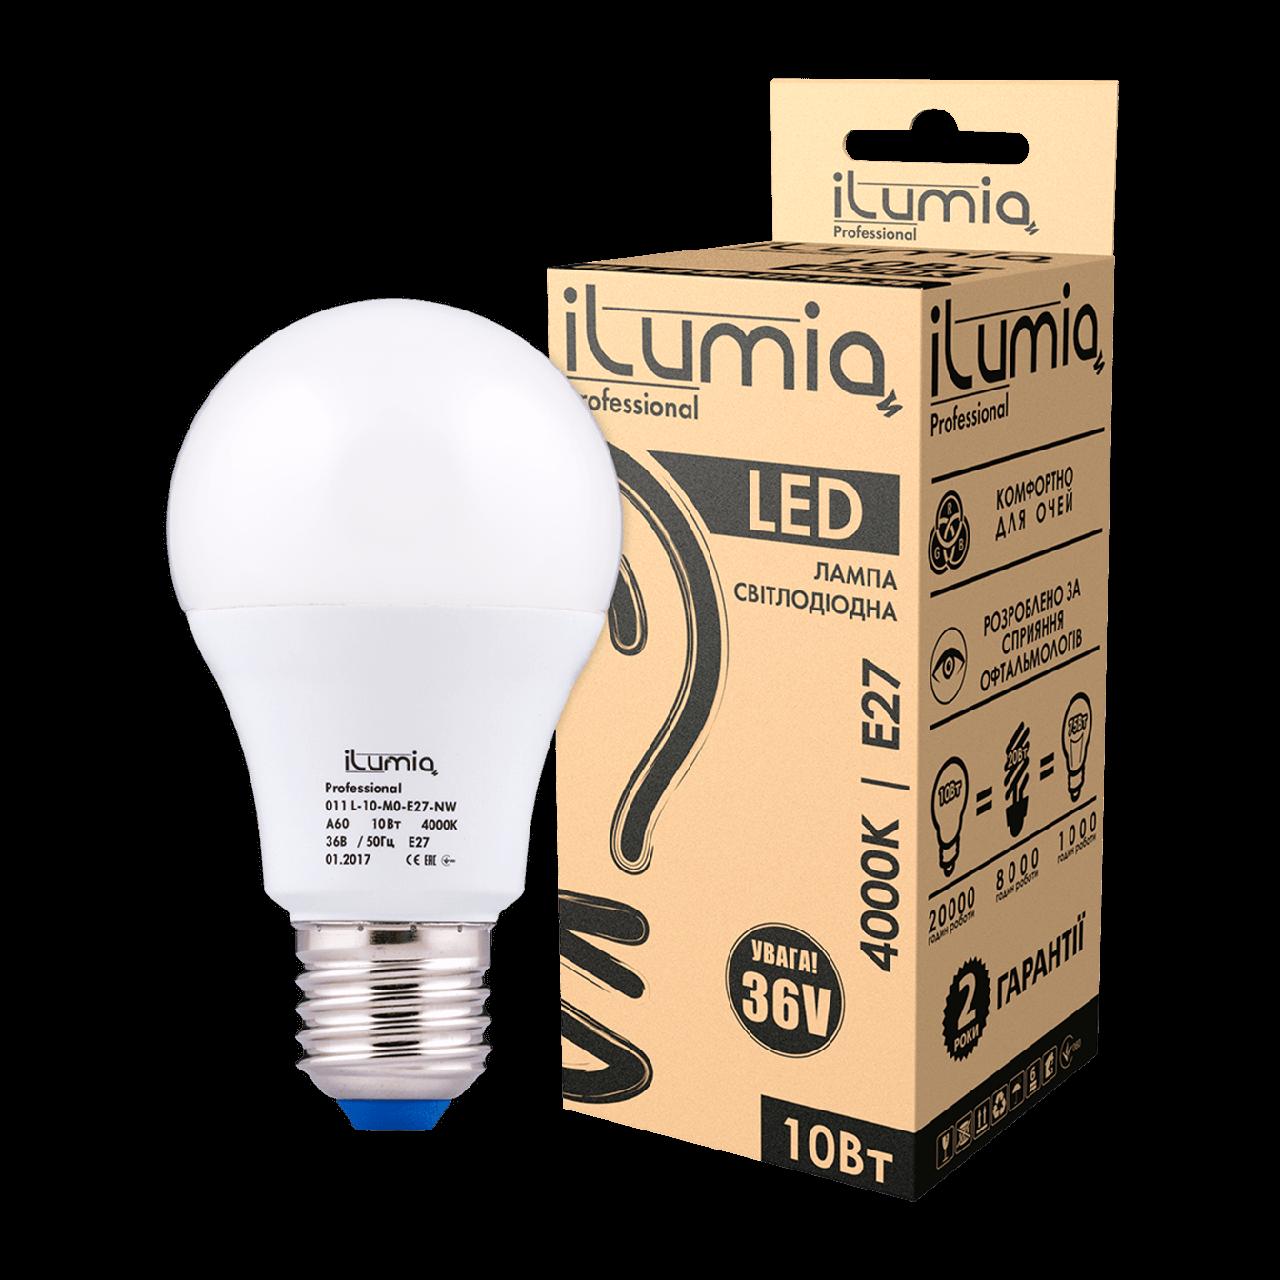 LED лампа Ilumia низковольтная 10W 36V Е27 A60 4000К нейтральный (011)